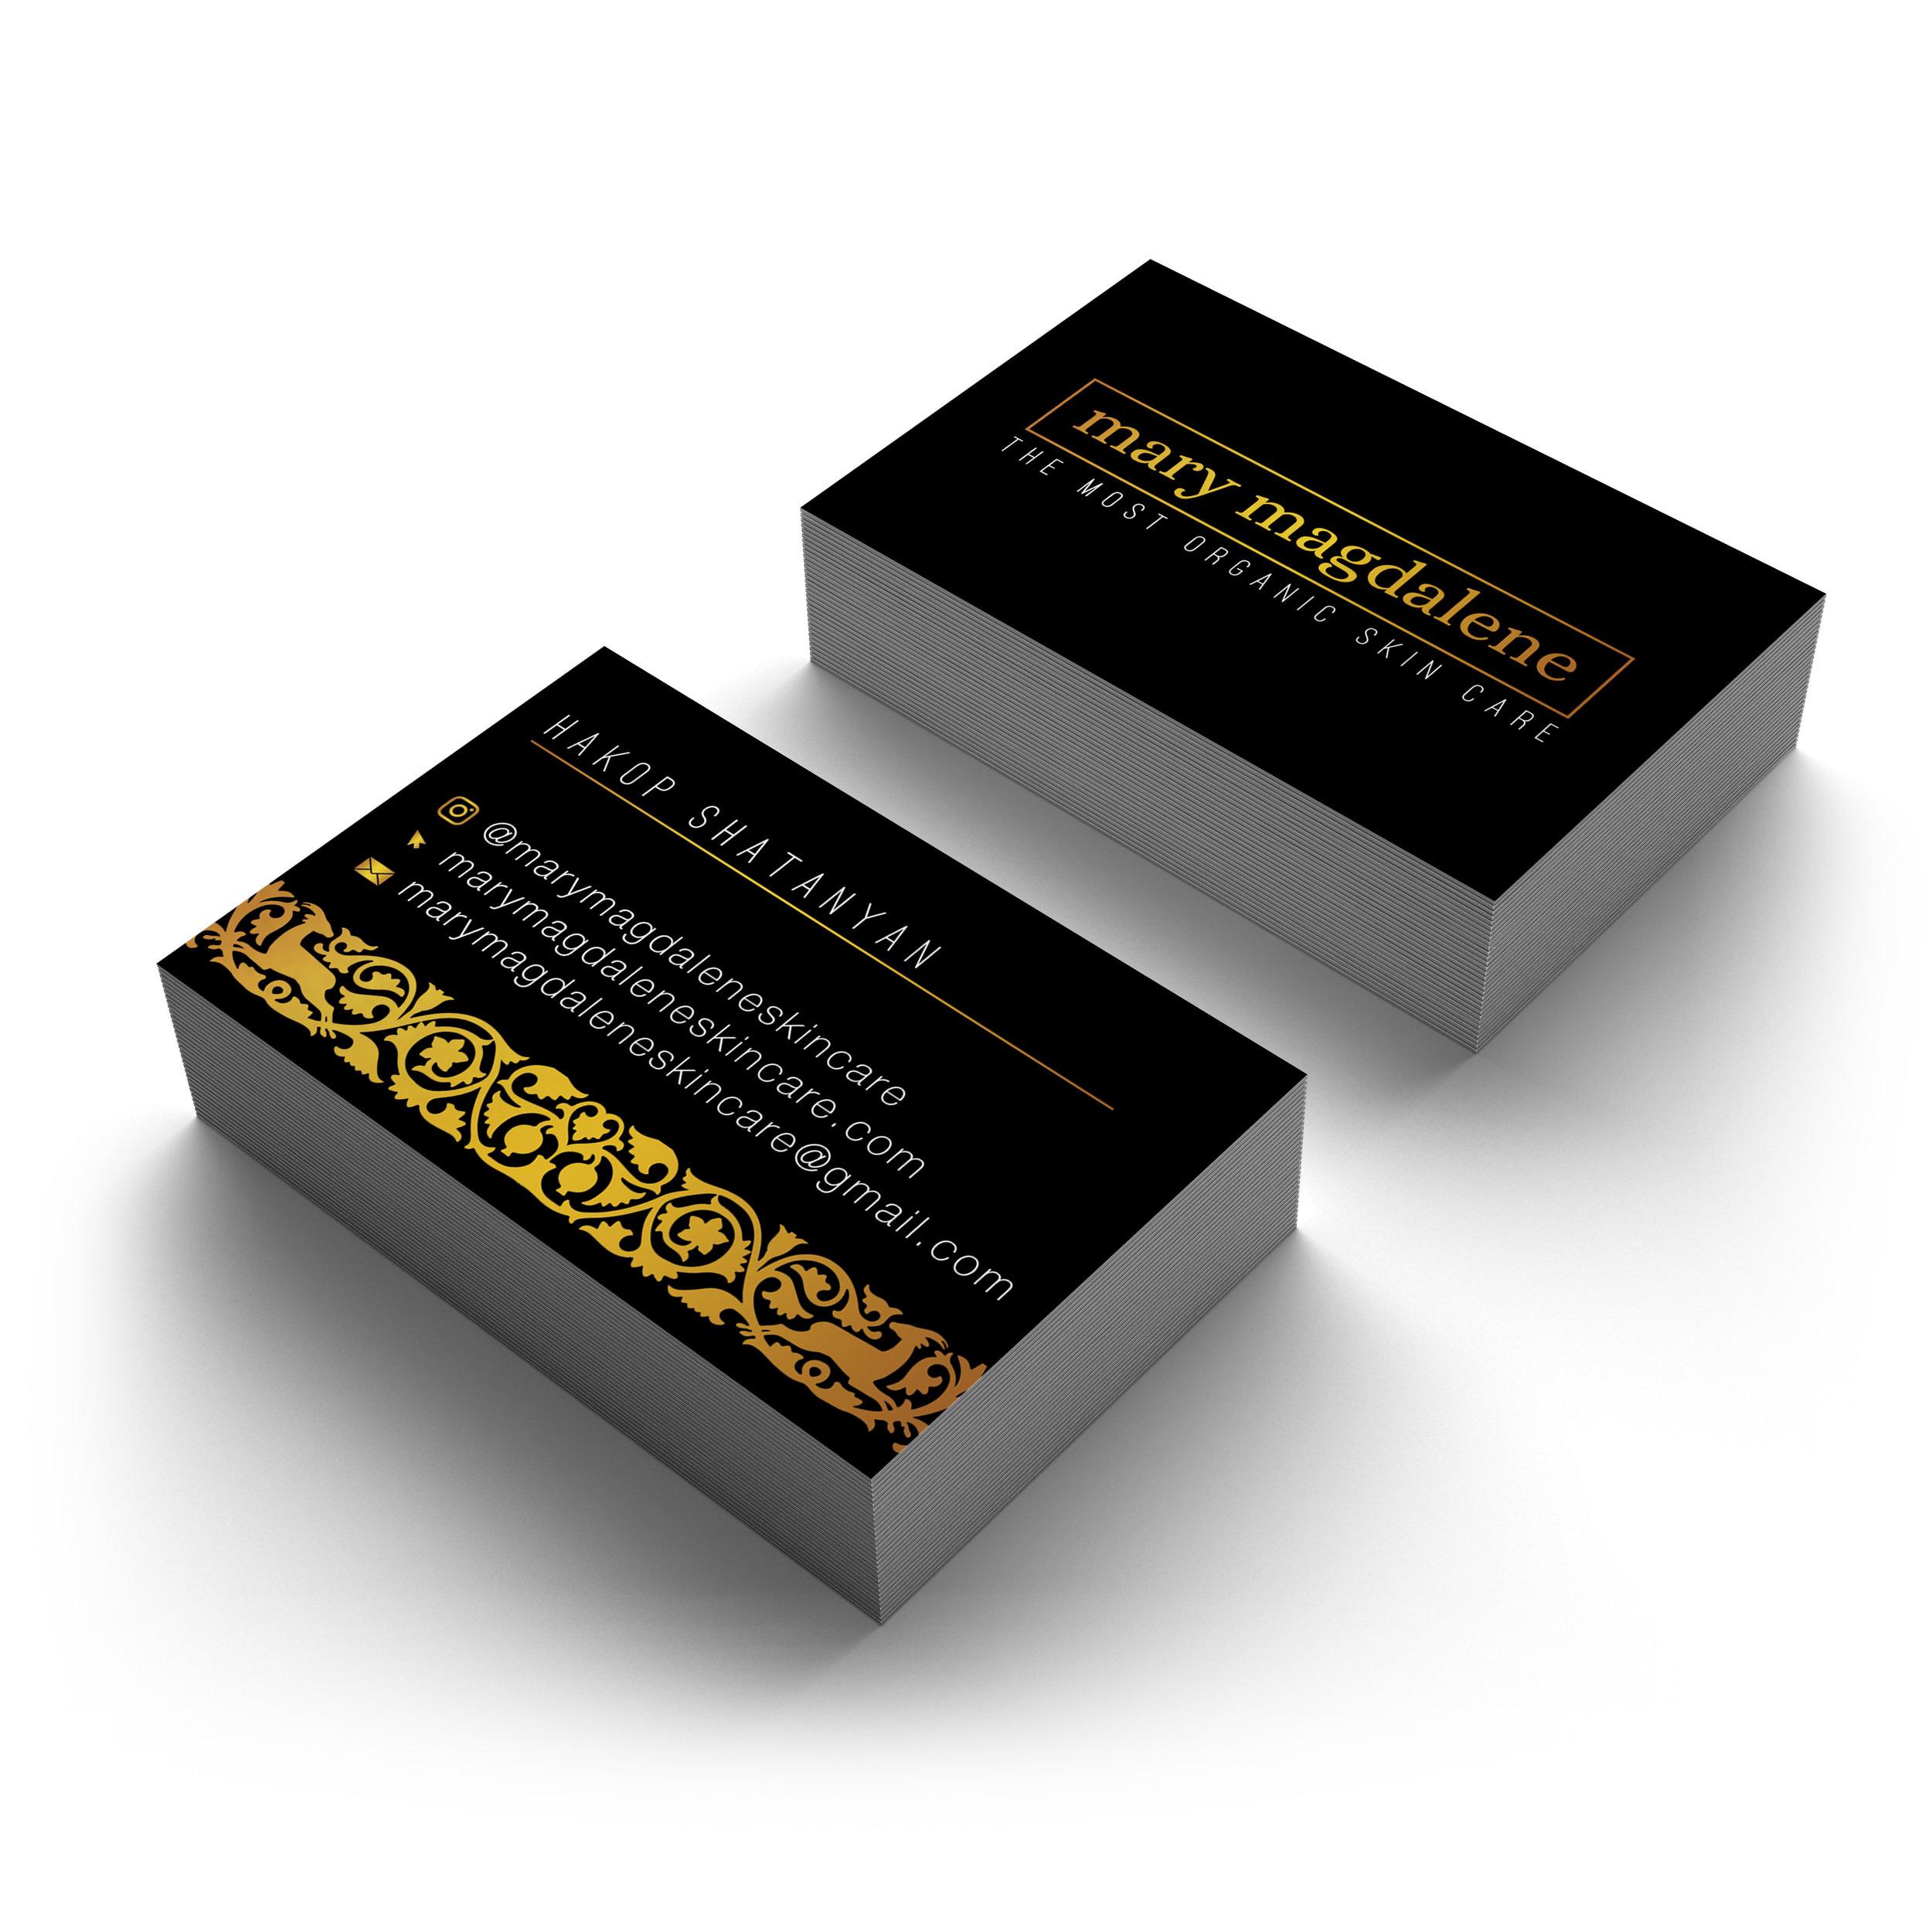 Mary Magdalene Skincare Business Cards (2)